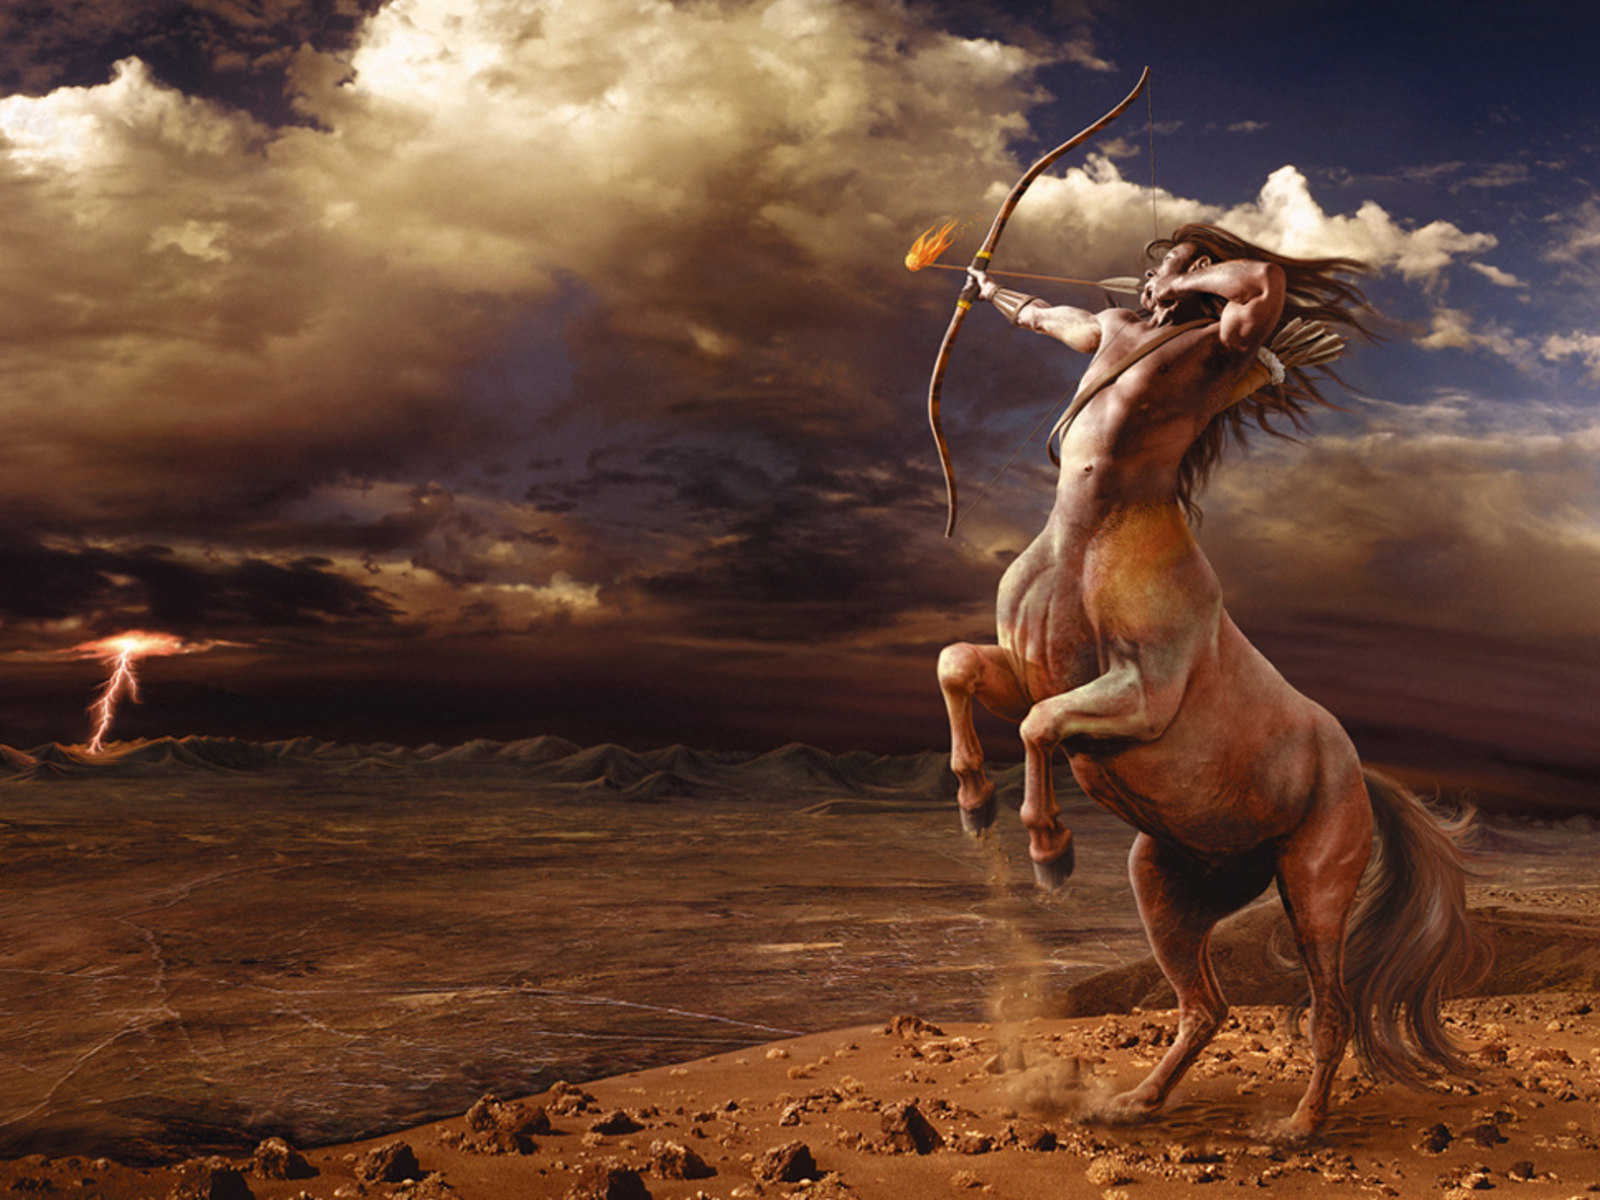 Fantasy Centaur 1600x1200